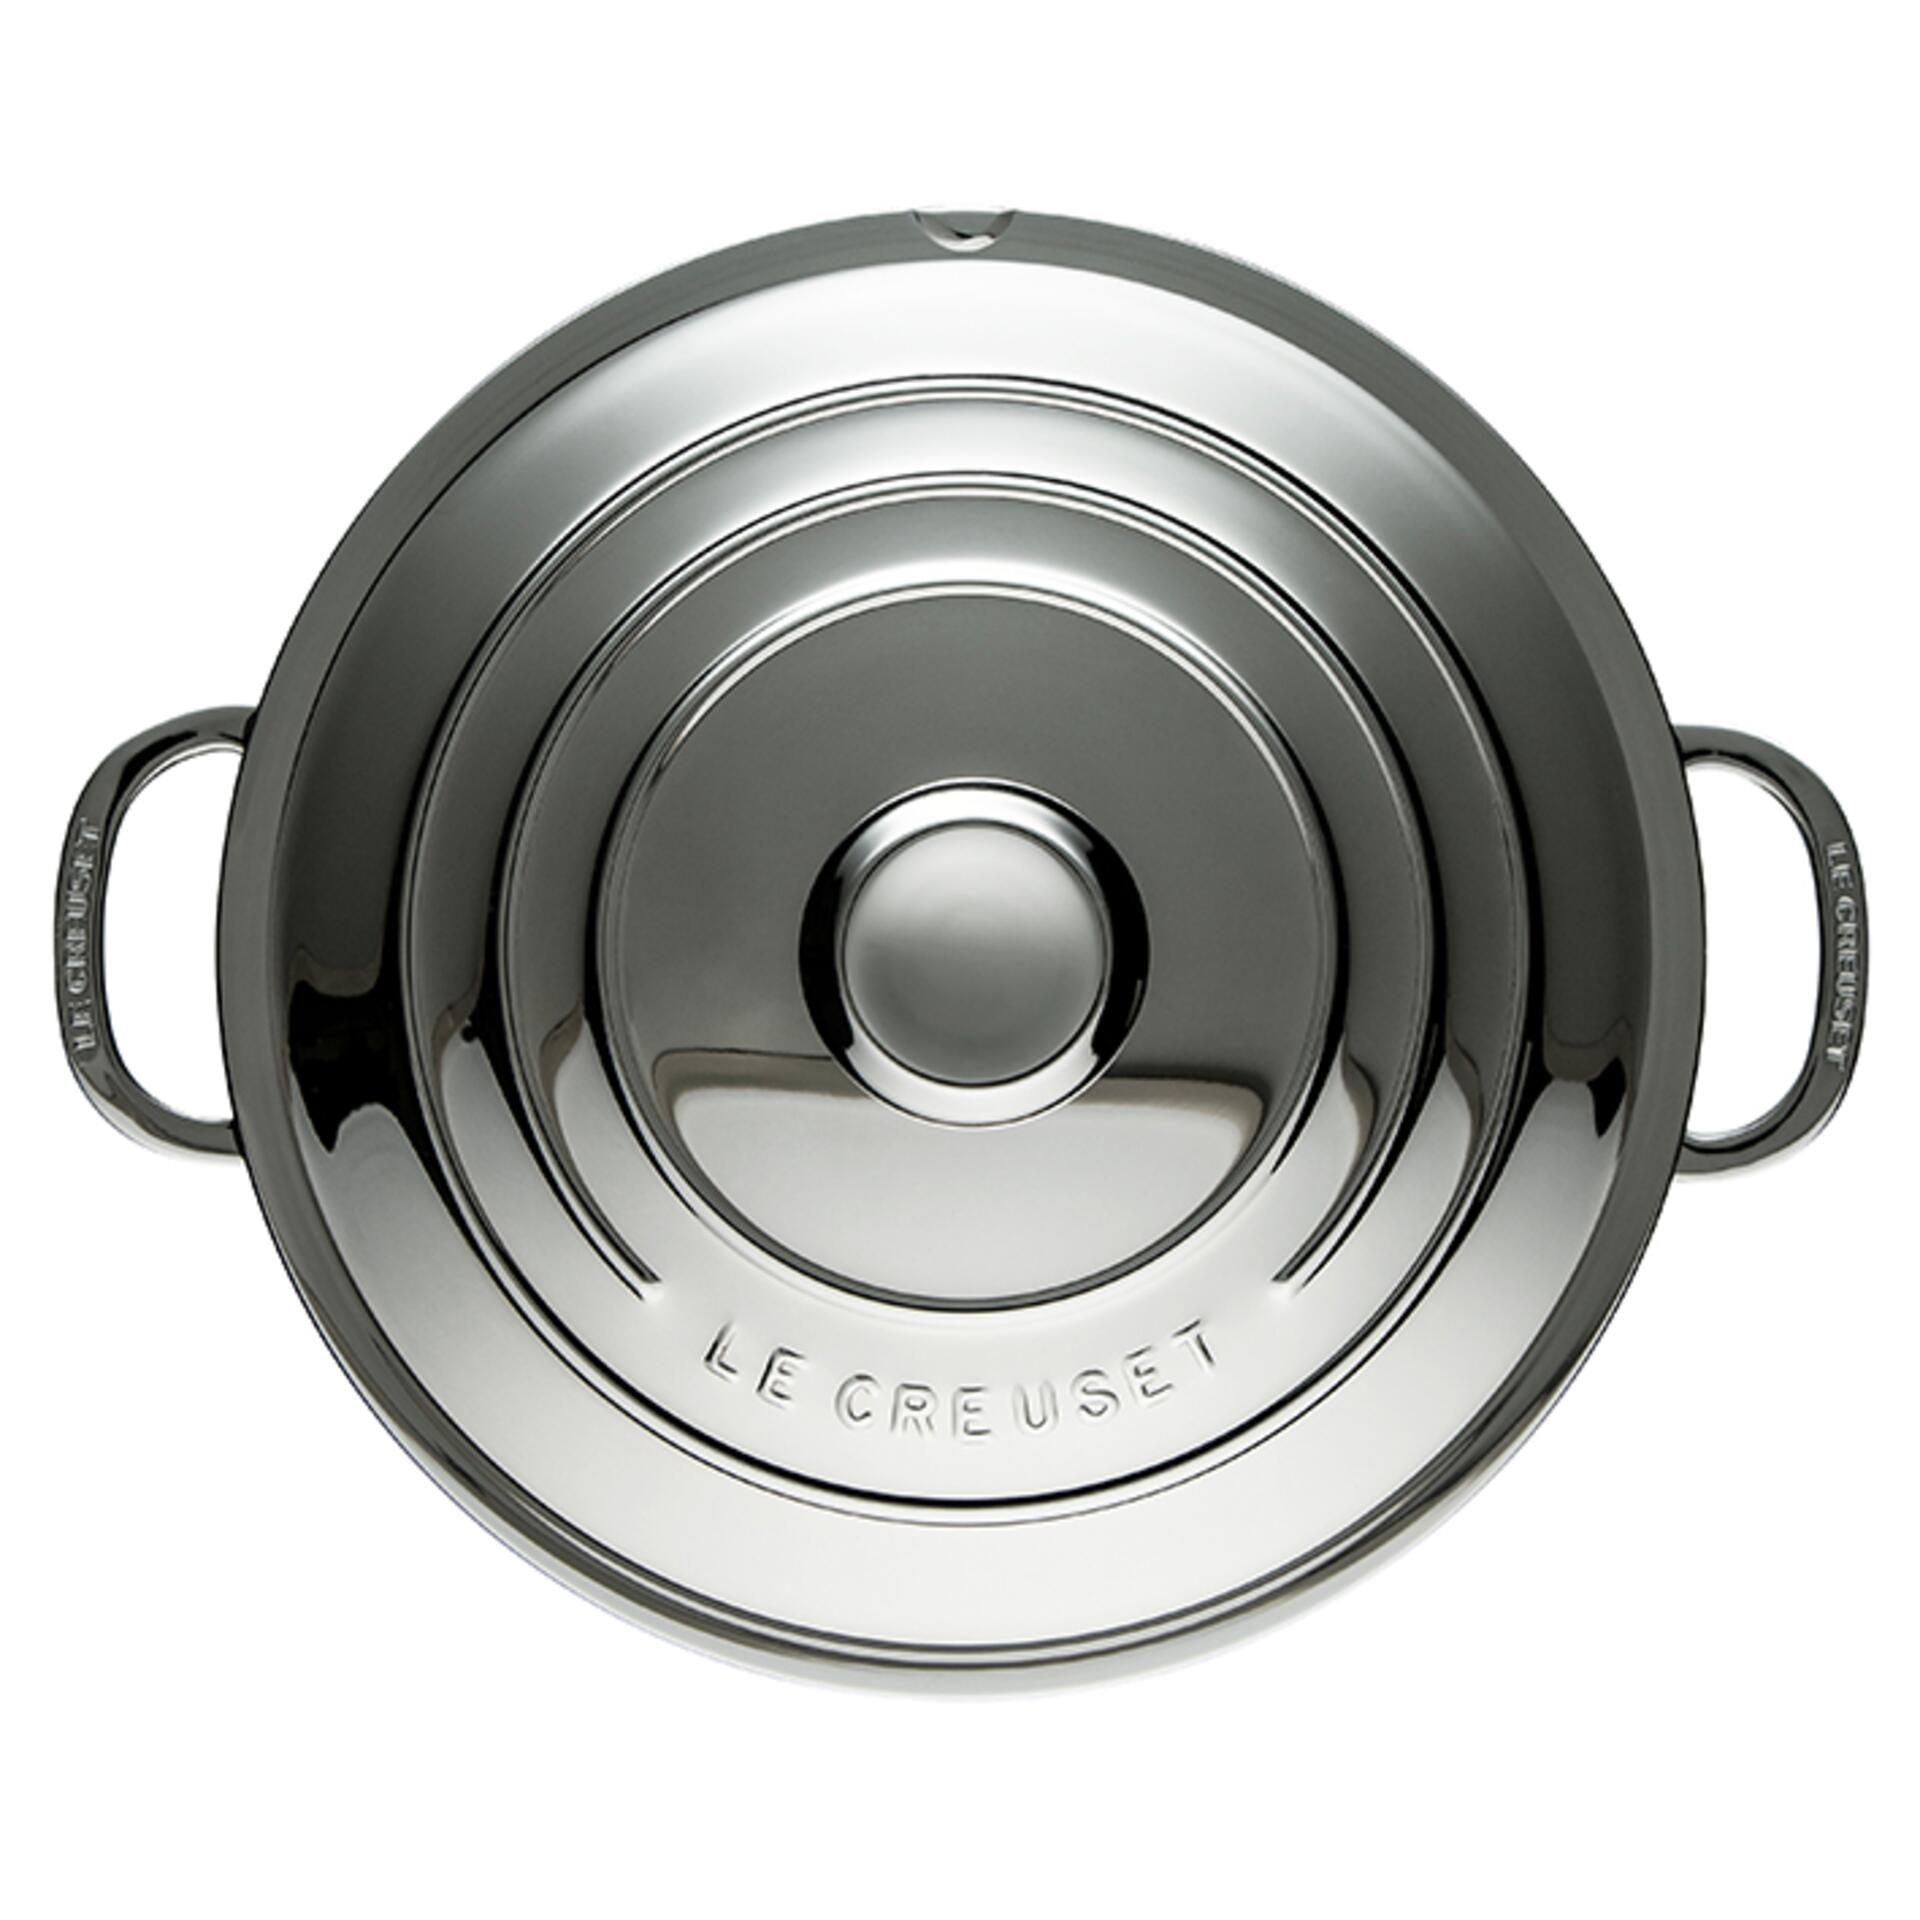 Le Creuset 3-ply PLUS Fleischtopf 24 cm